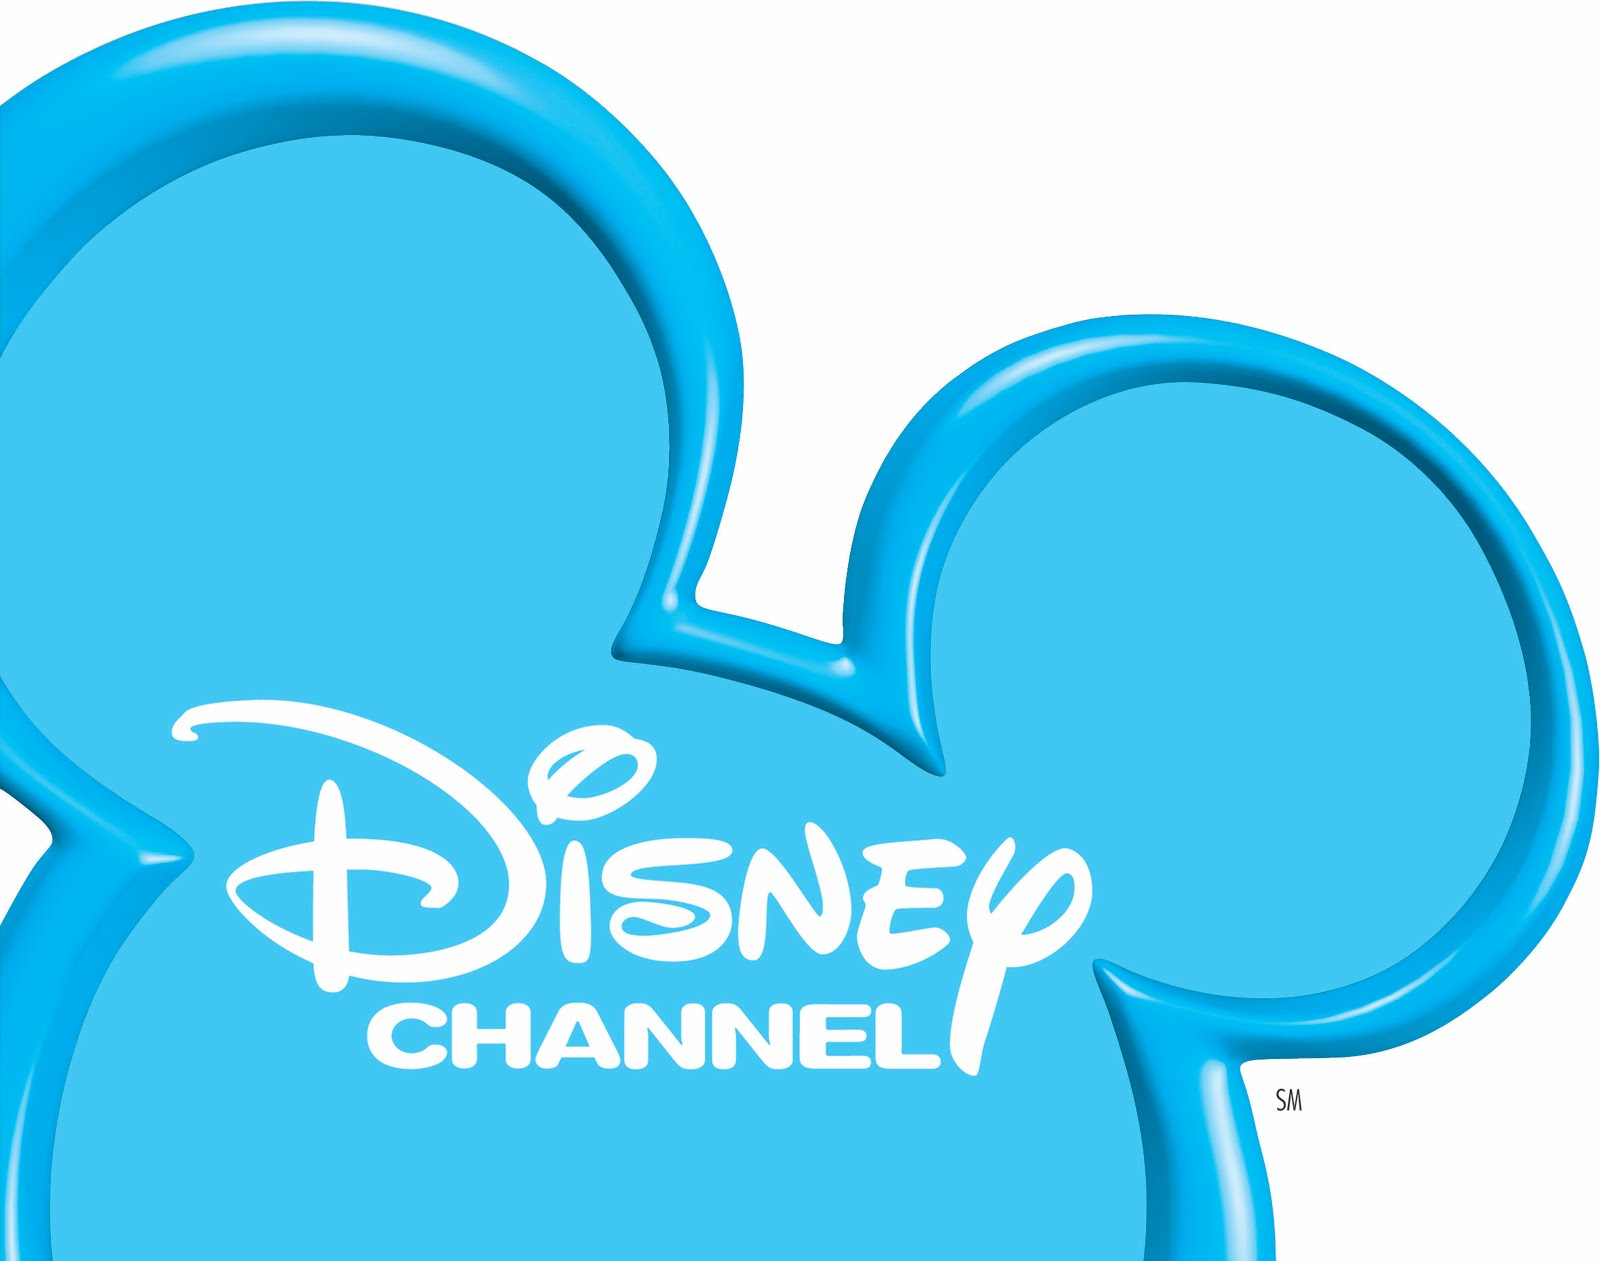 Disney Channel Logo Png Eps Free Indian Logos